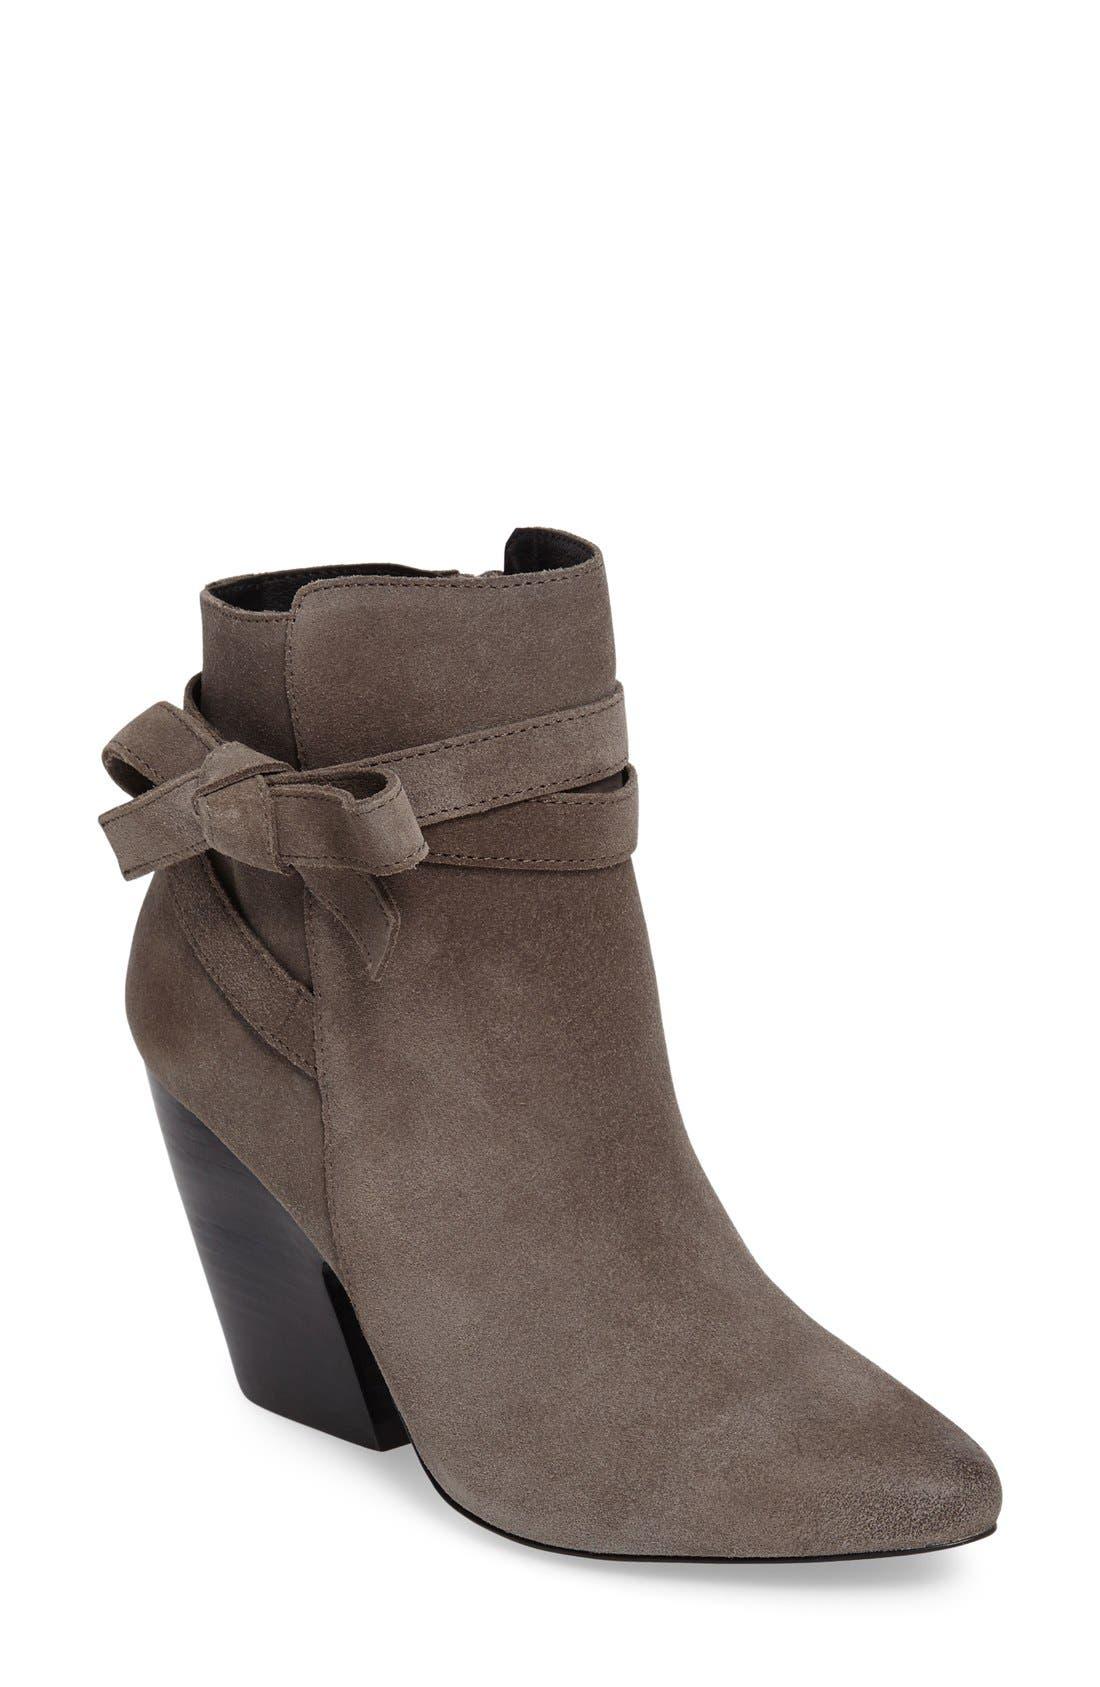 Jax Block Heel Bootie,                         Main,                         color, Mouse Grey Leather